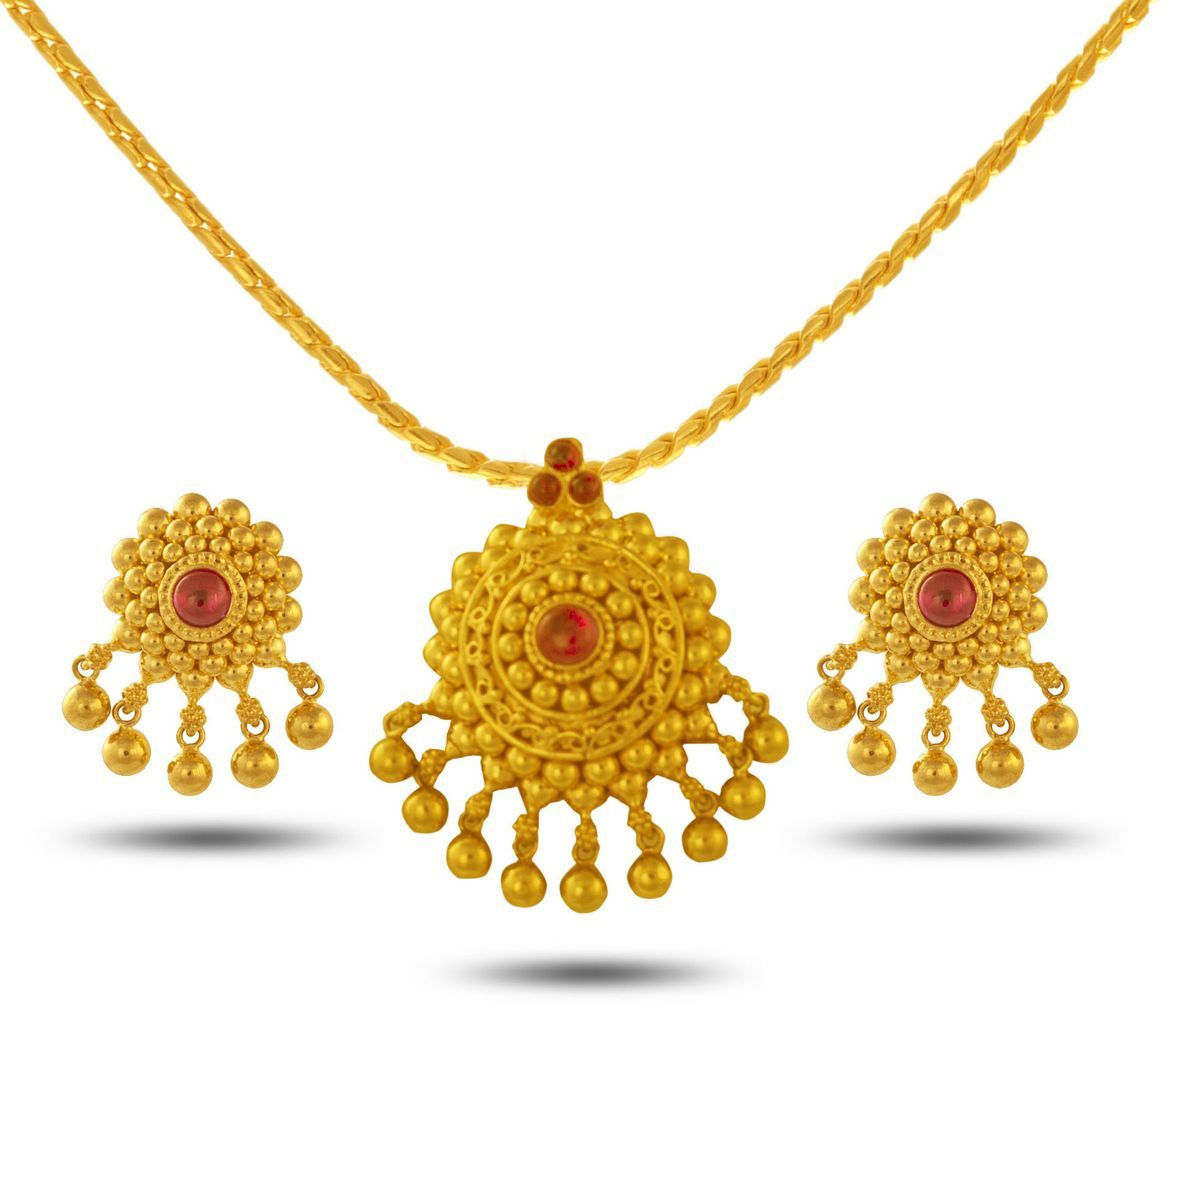 Pin by abhishek verma on jewellery pinterest pendant set gold